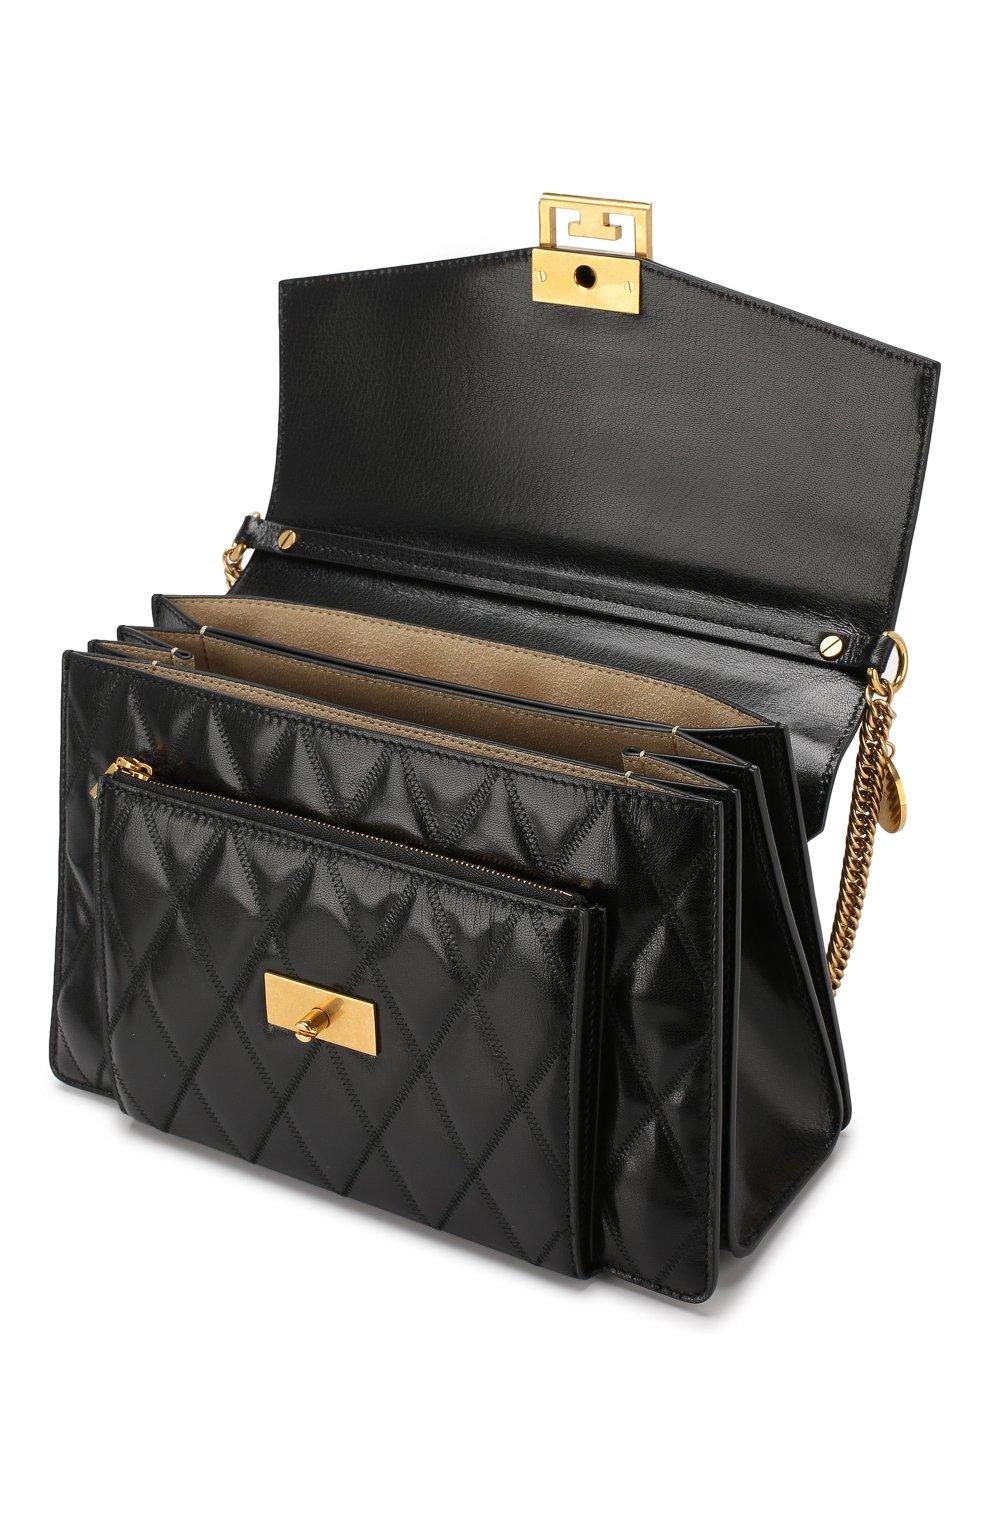 Сумка GV3 medium Givenchy черная цвета   Фото №4